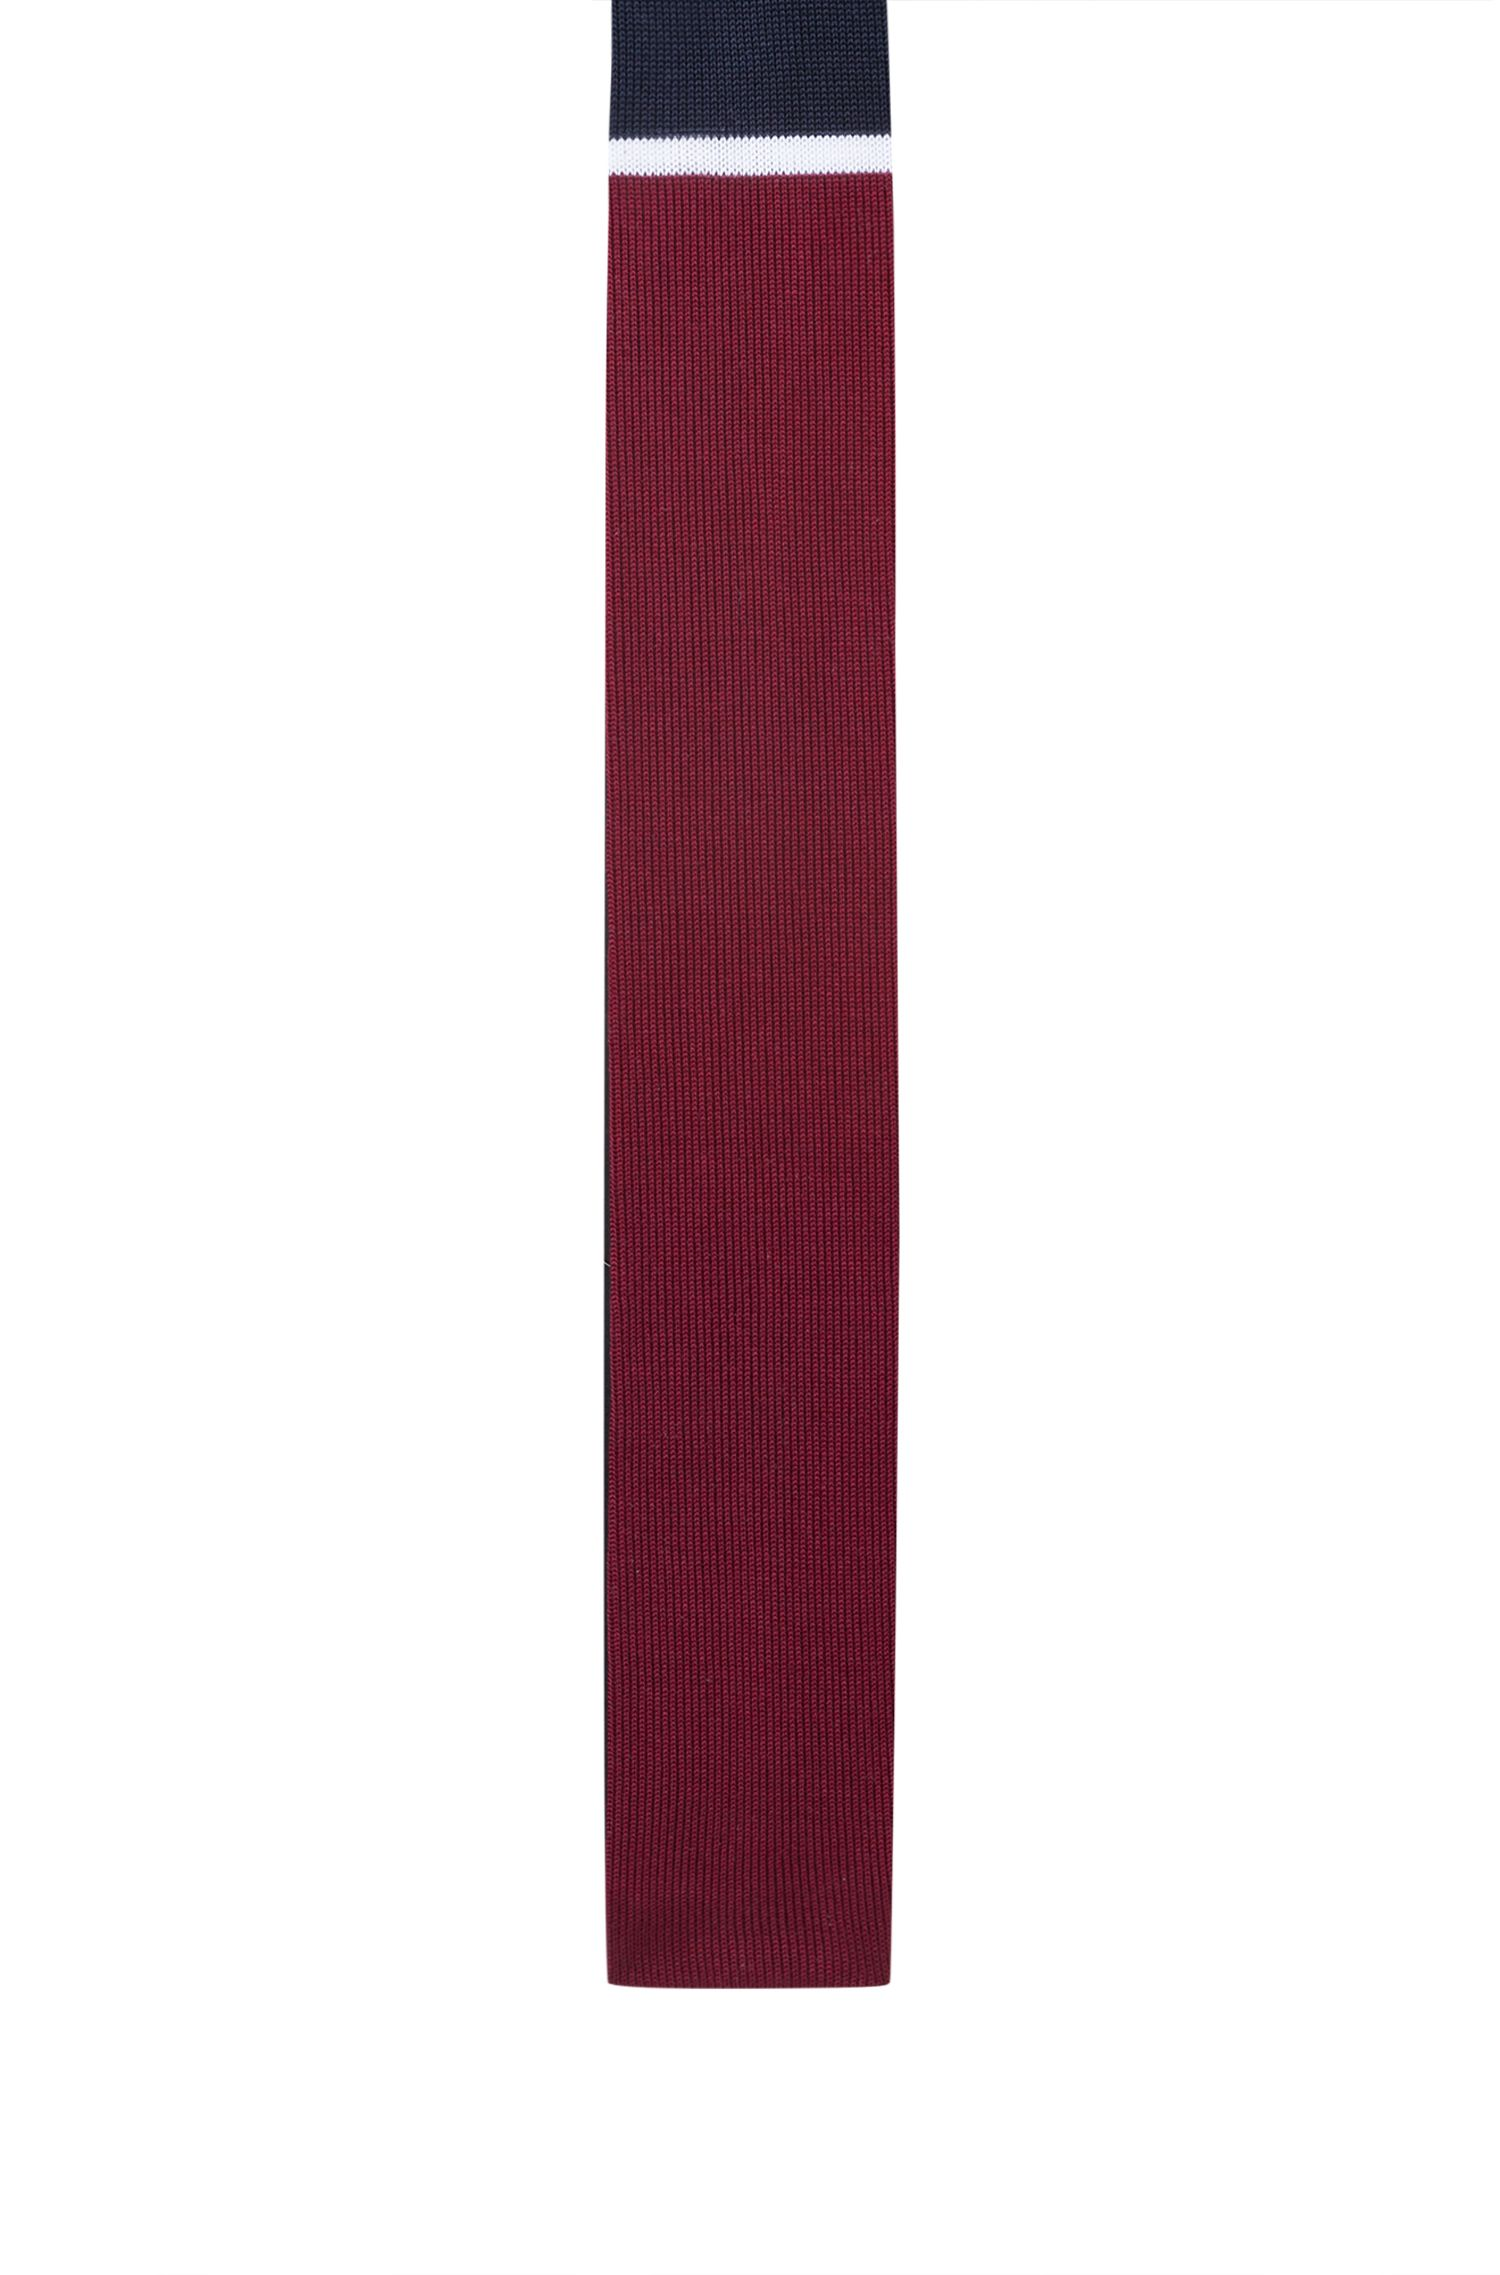 Corbata de punto de algodón con bloques de color, Rojo oscuro